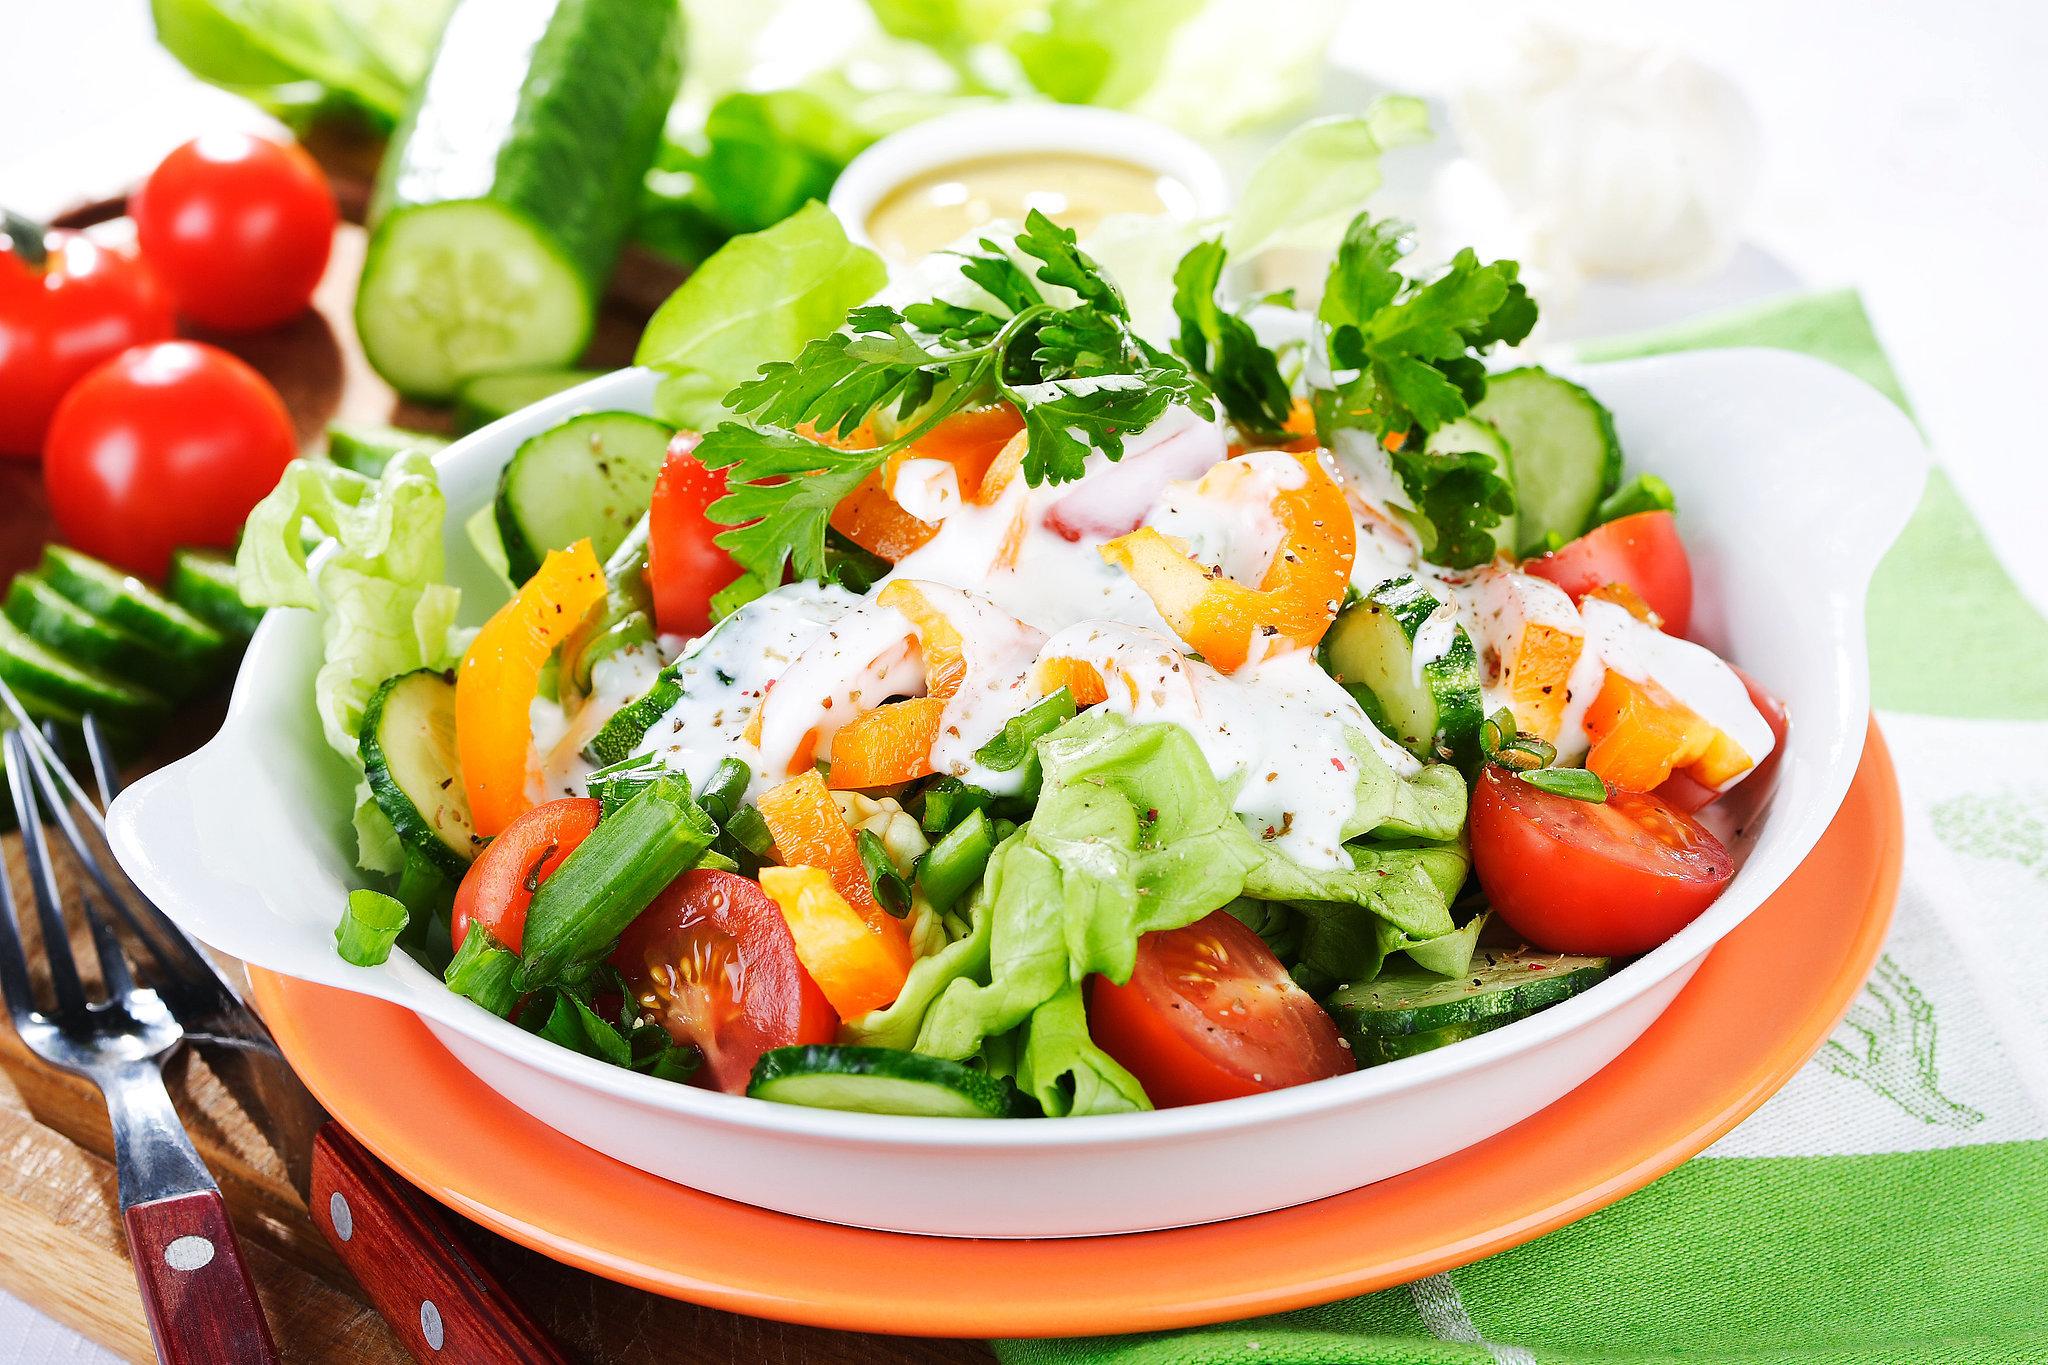 10 idee per cena vegetariana veloce